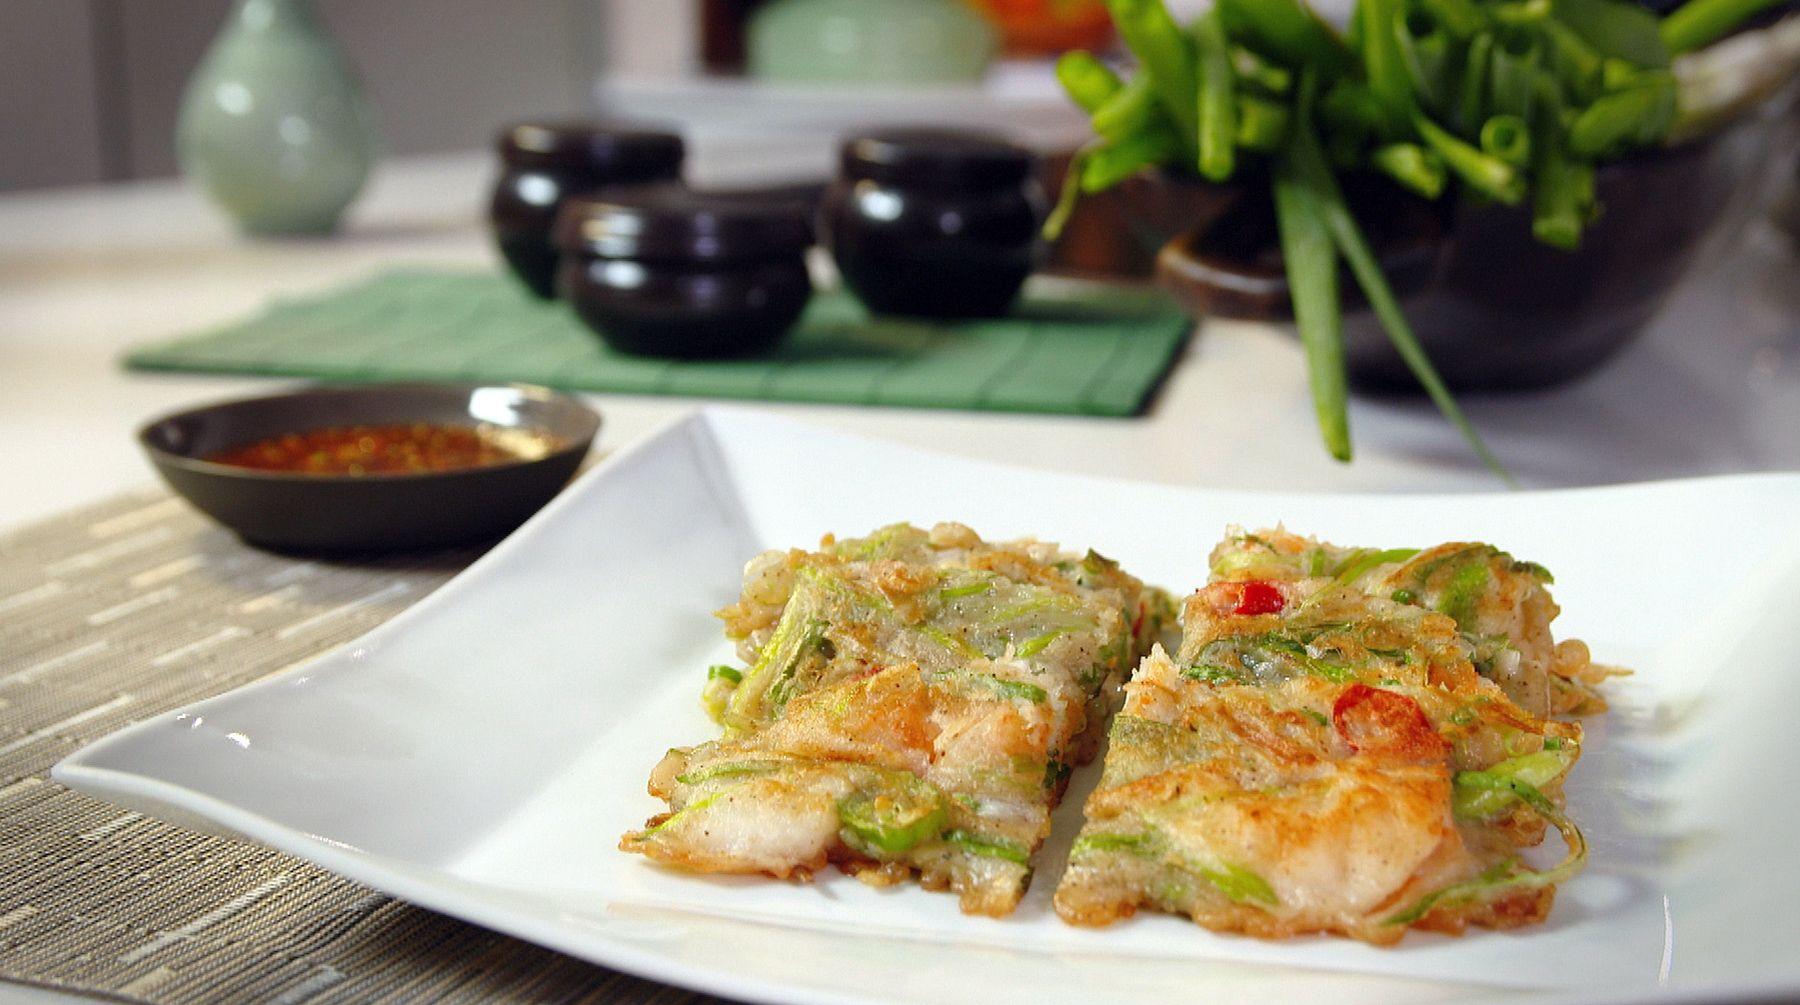 Judy joo shows us simple yet spectacular korean inspired dishes from korean seafood pajeon korean pancake recipe by judy joo food network uk forumfinder Choice Image